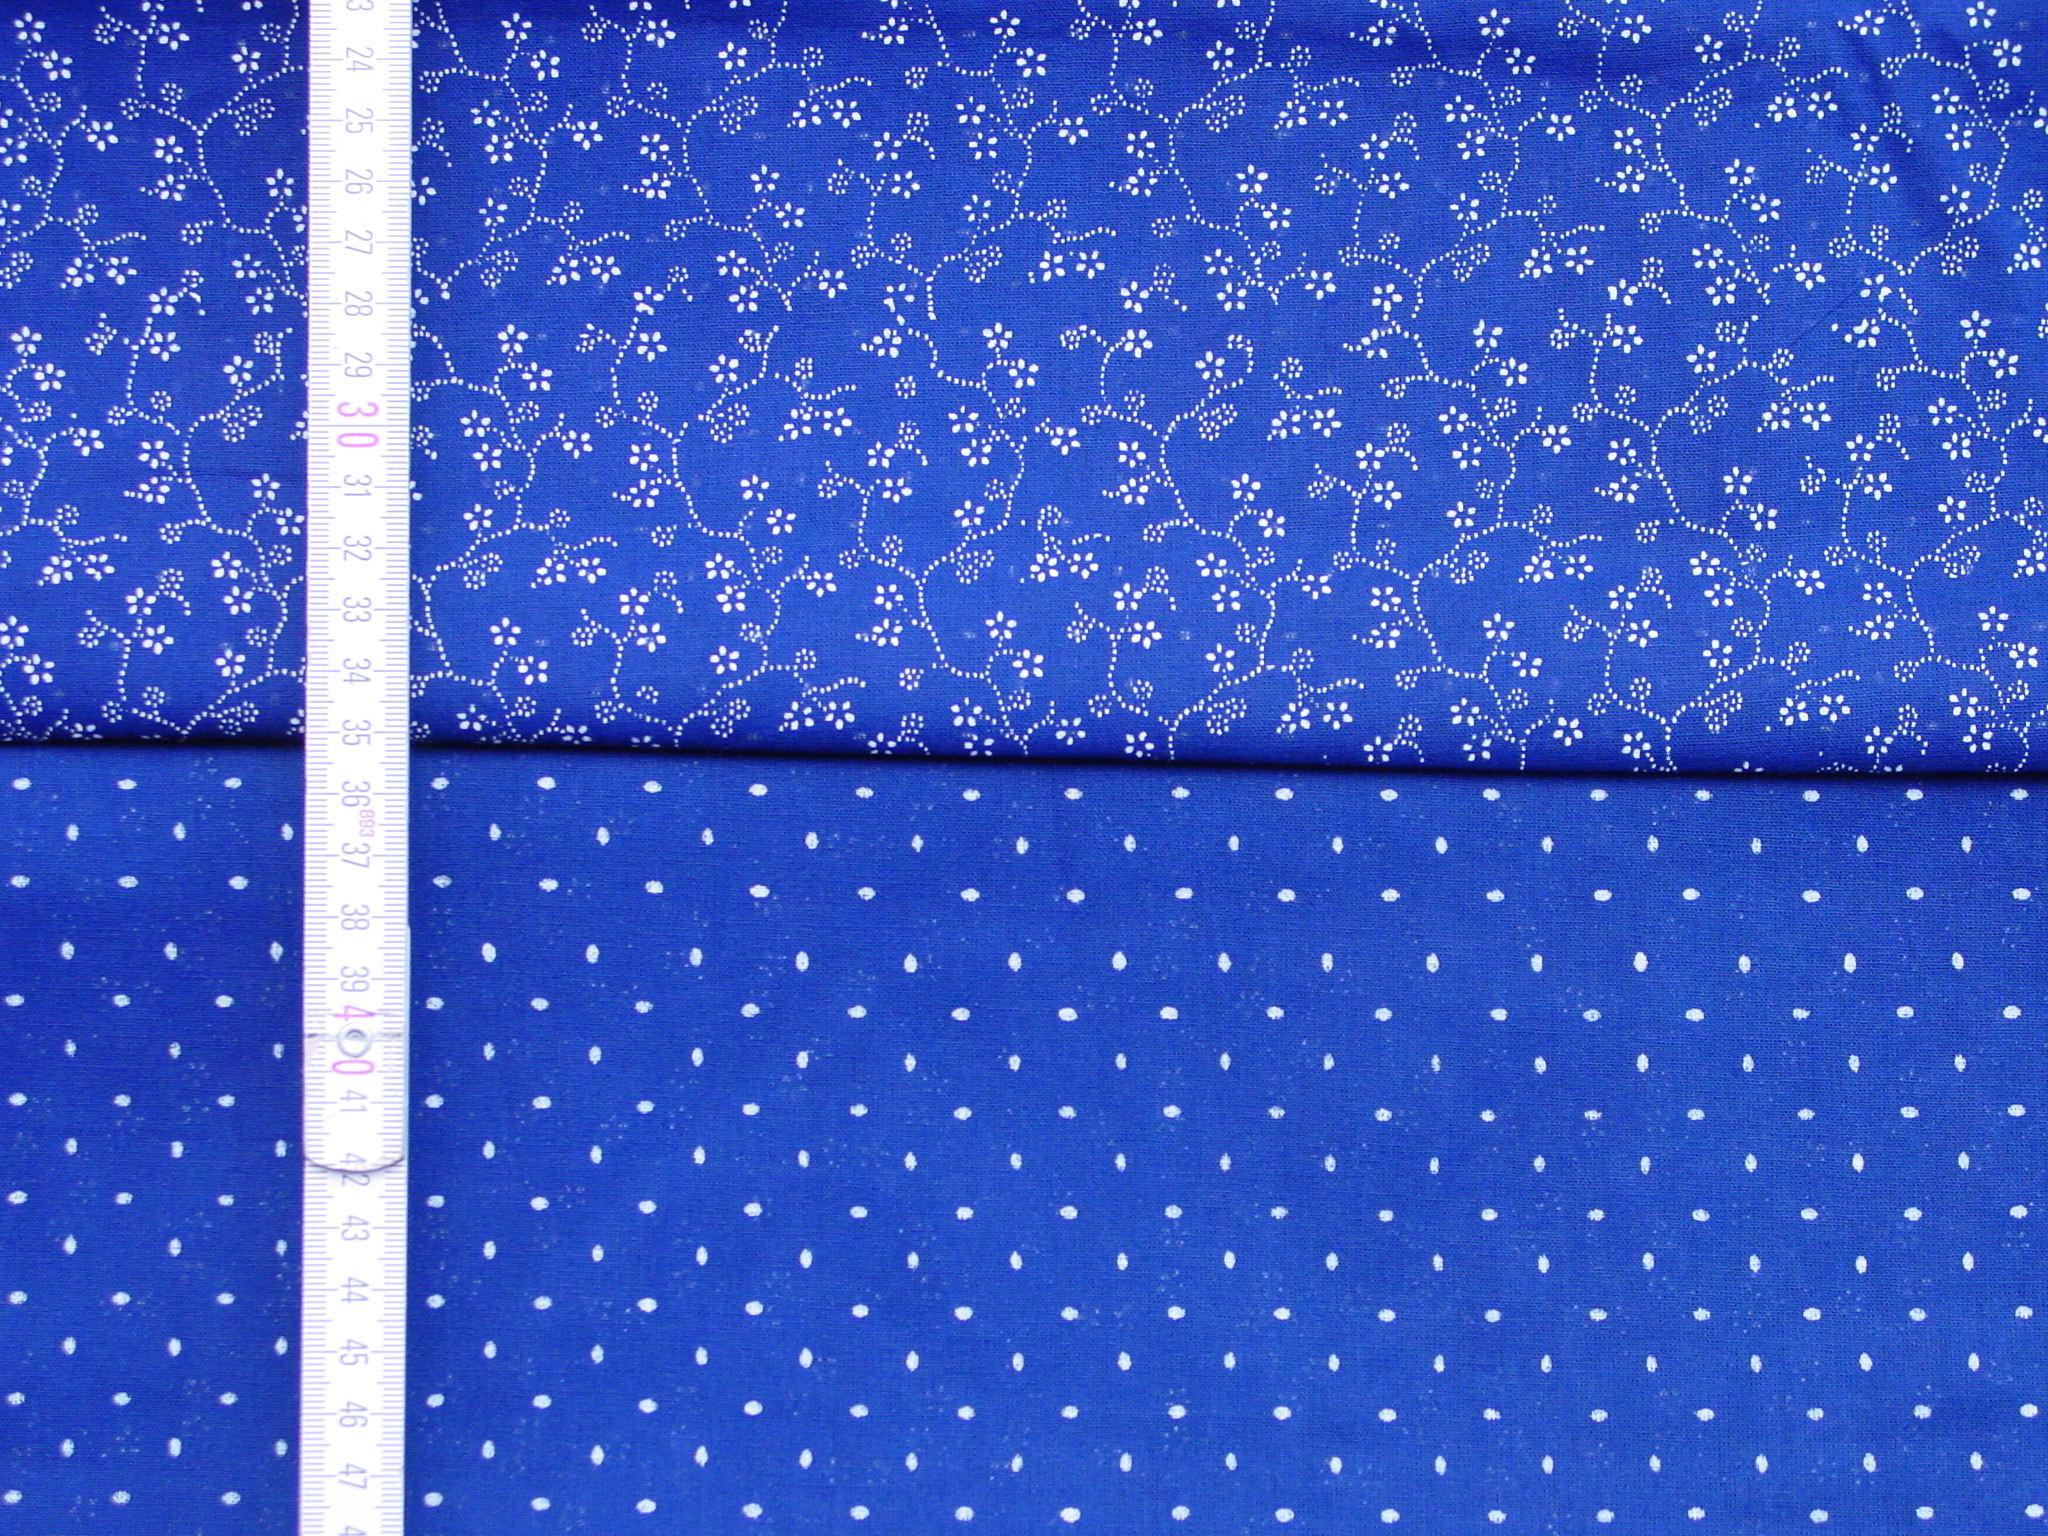 Doppeldruck-Blaudruckstoff 052-0